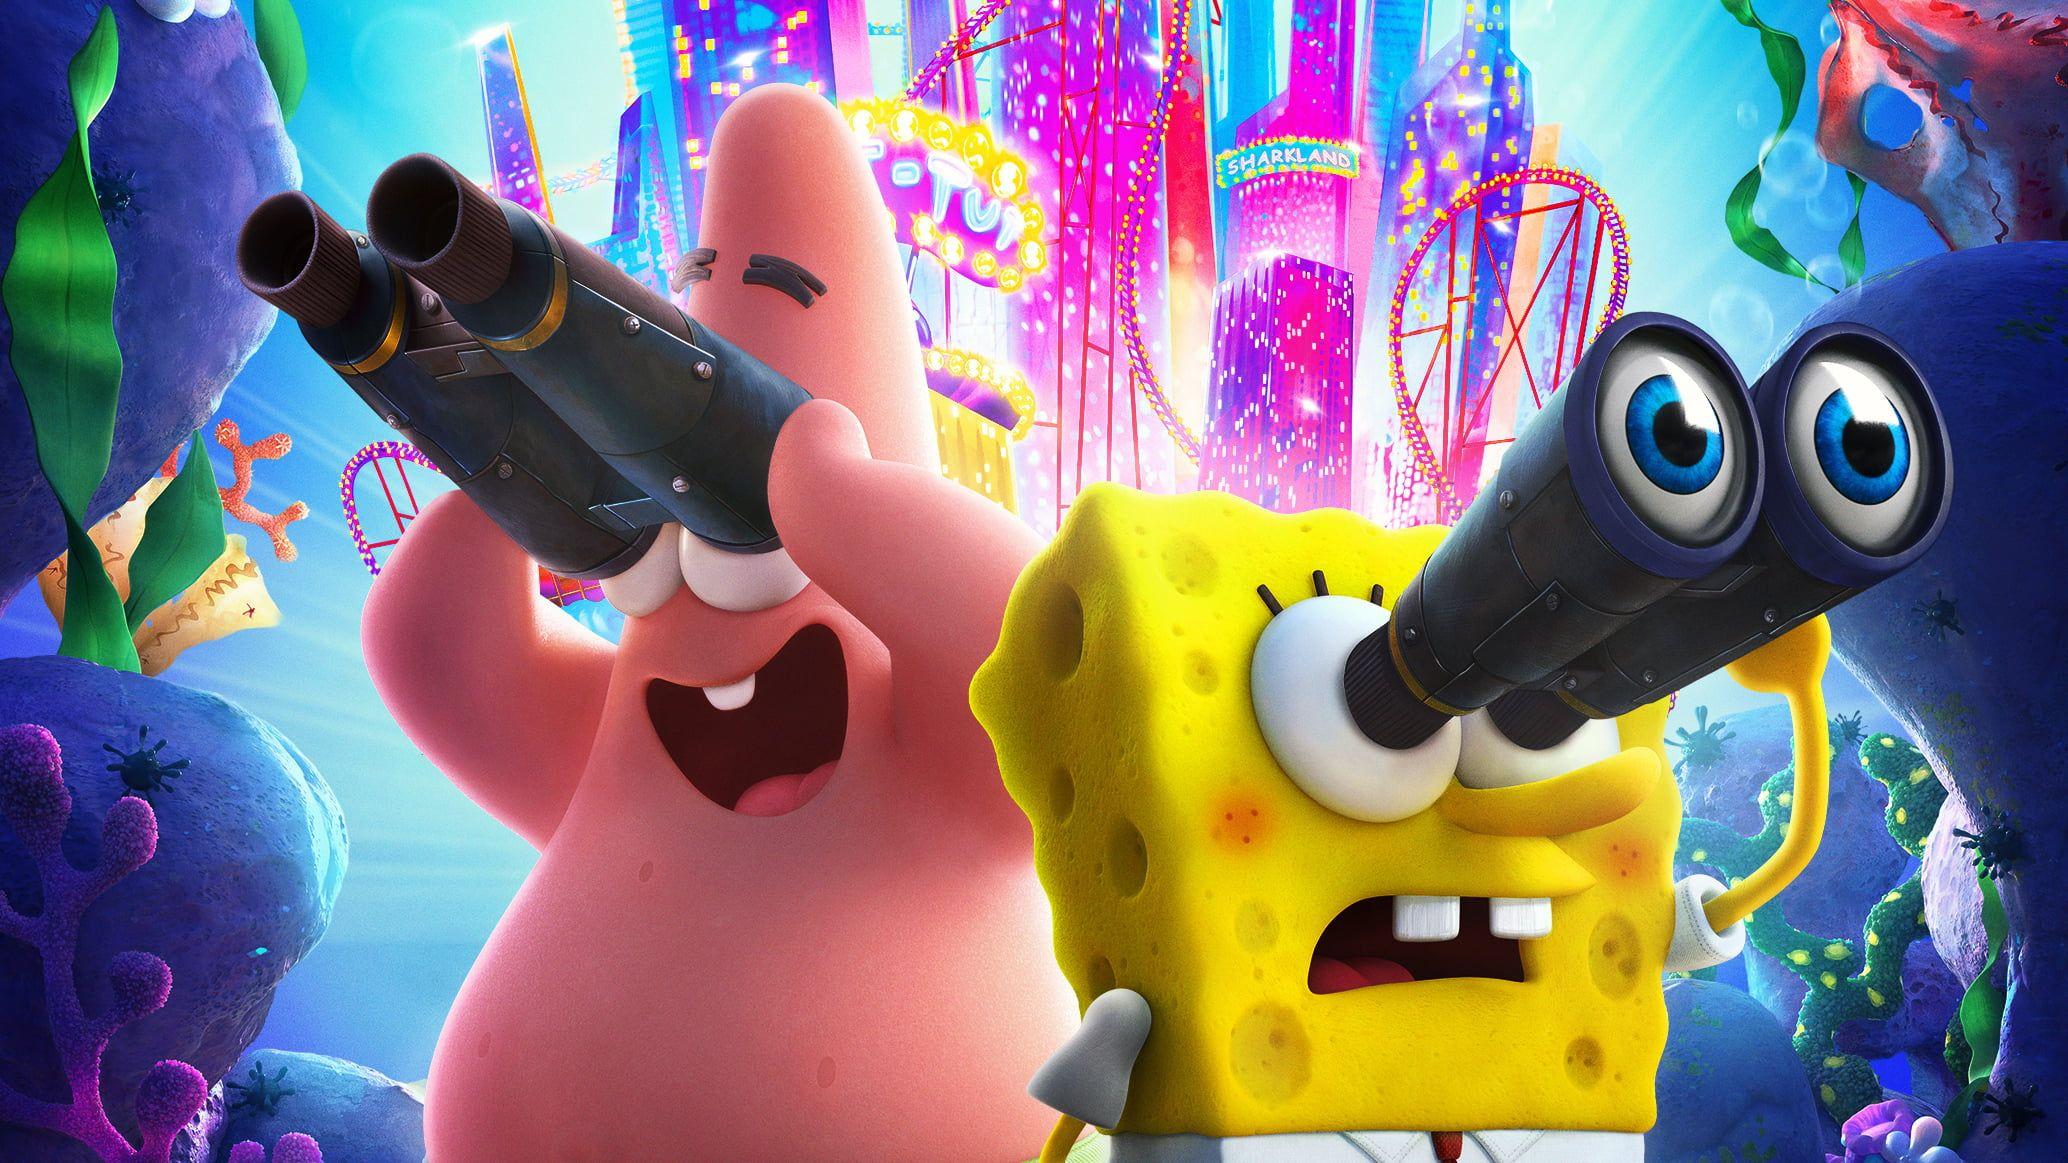 HD wallpaper: Movie, The SpongeBob Movie: Sponge on the Run, Patrick Star